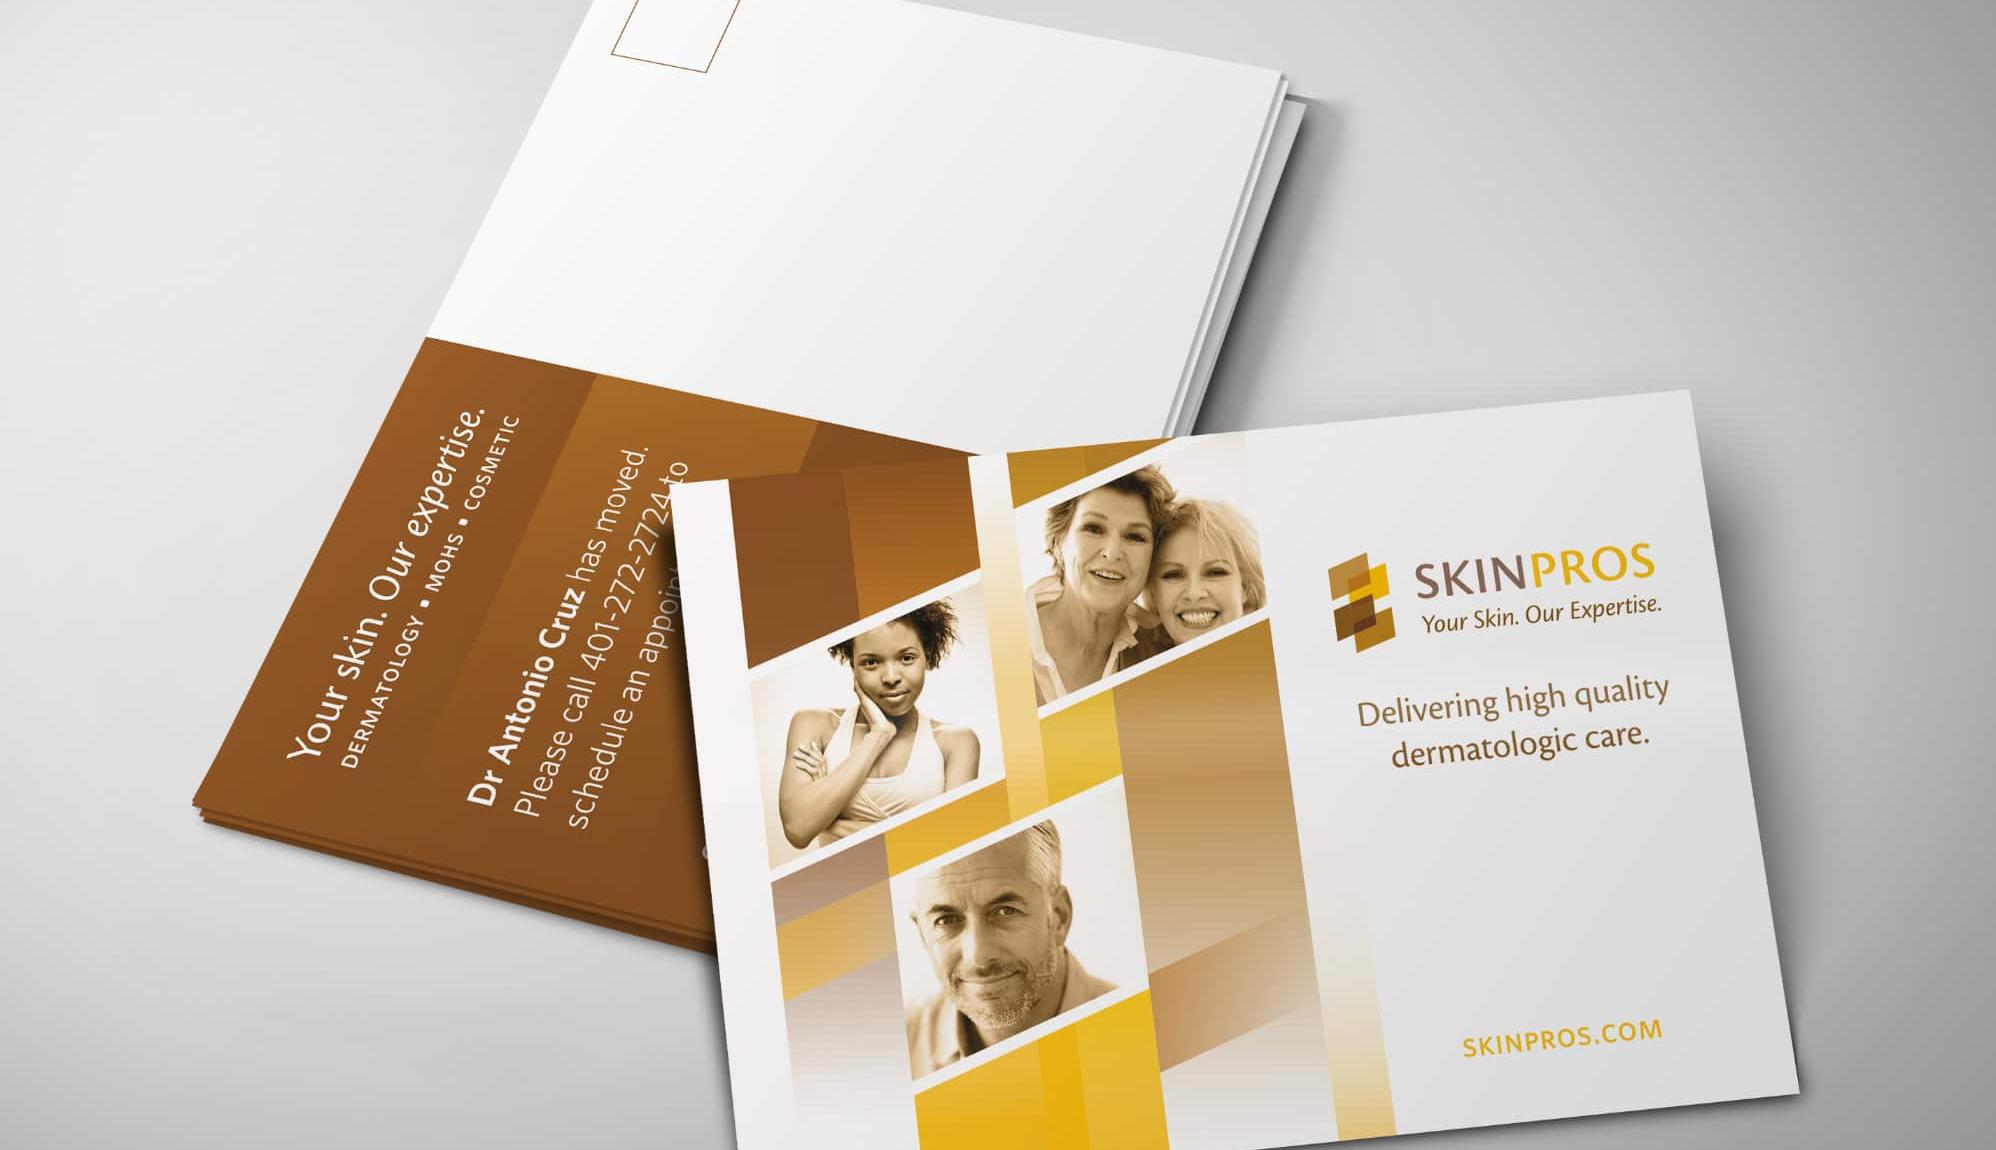 posctard and brochure design